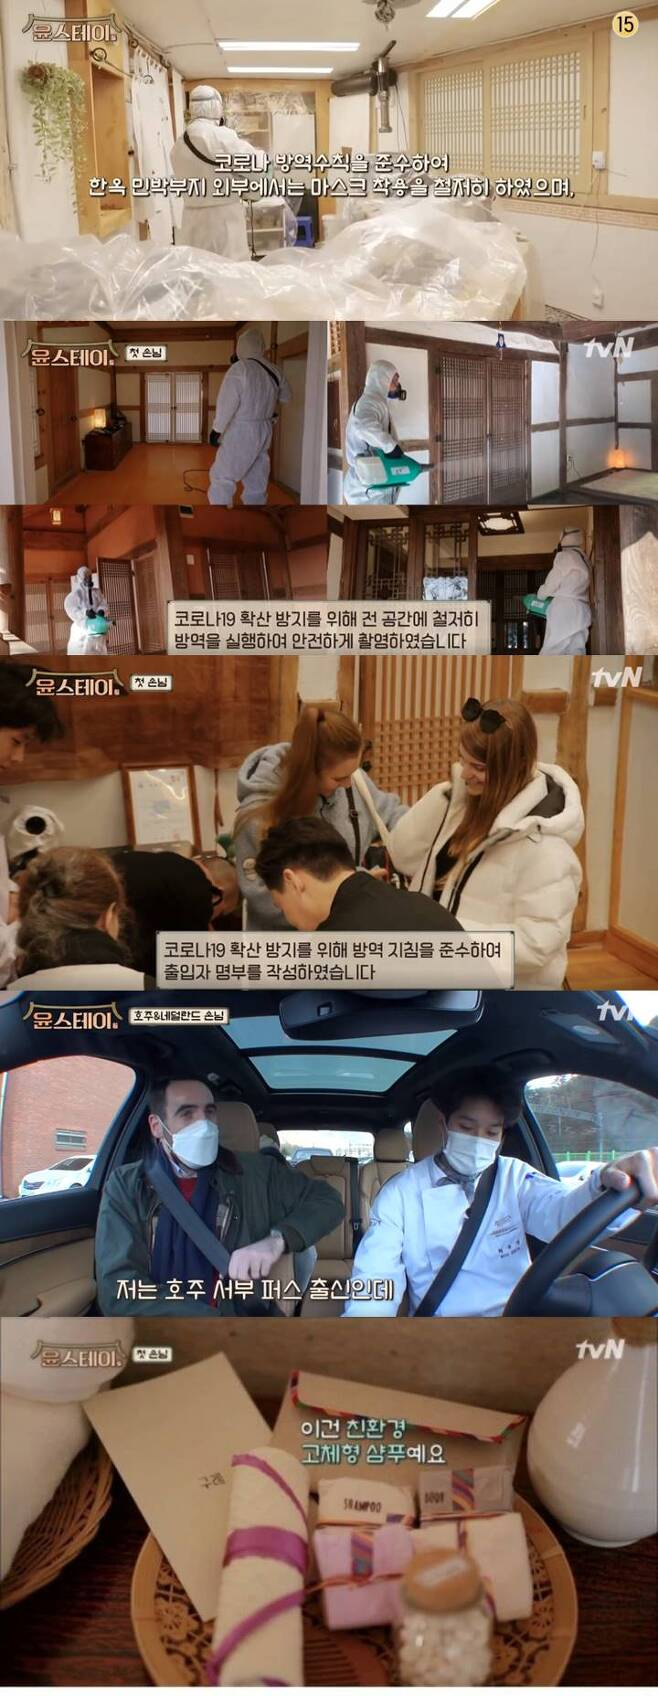 ▲ tvN '윤스테이' 방송화면 캡처